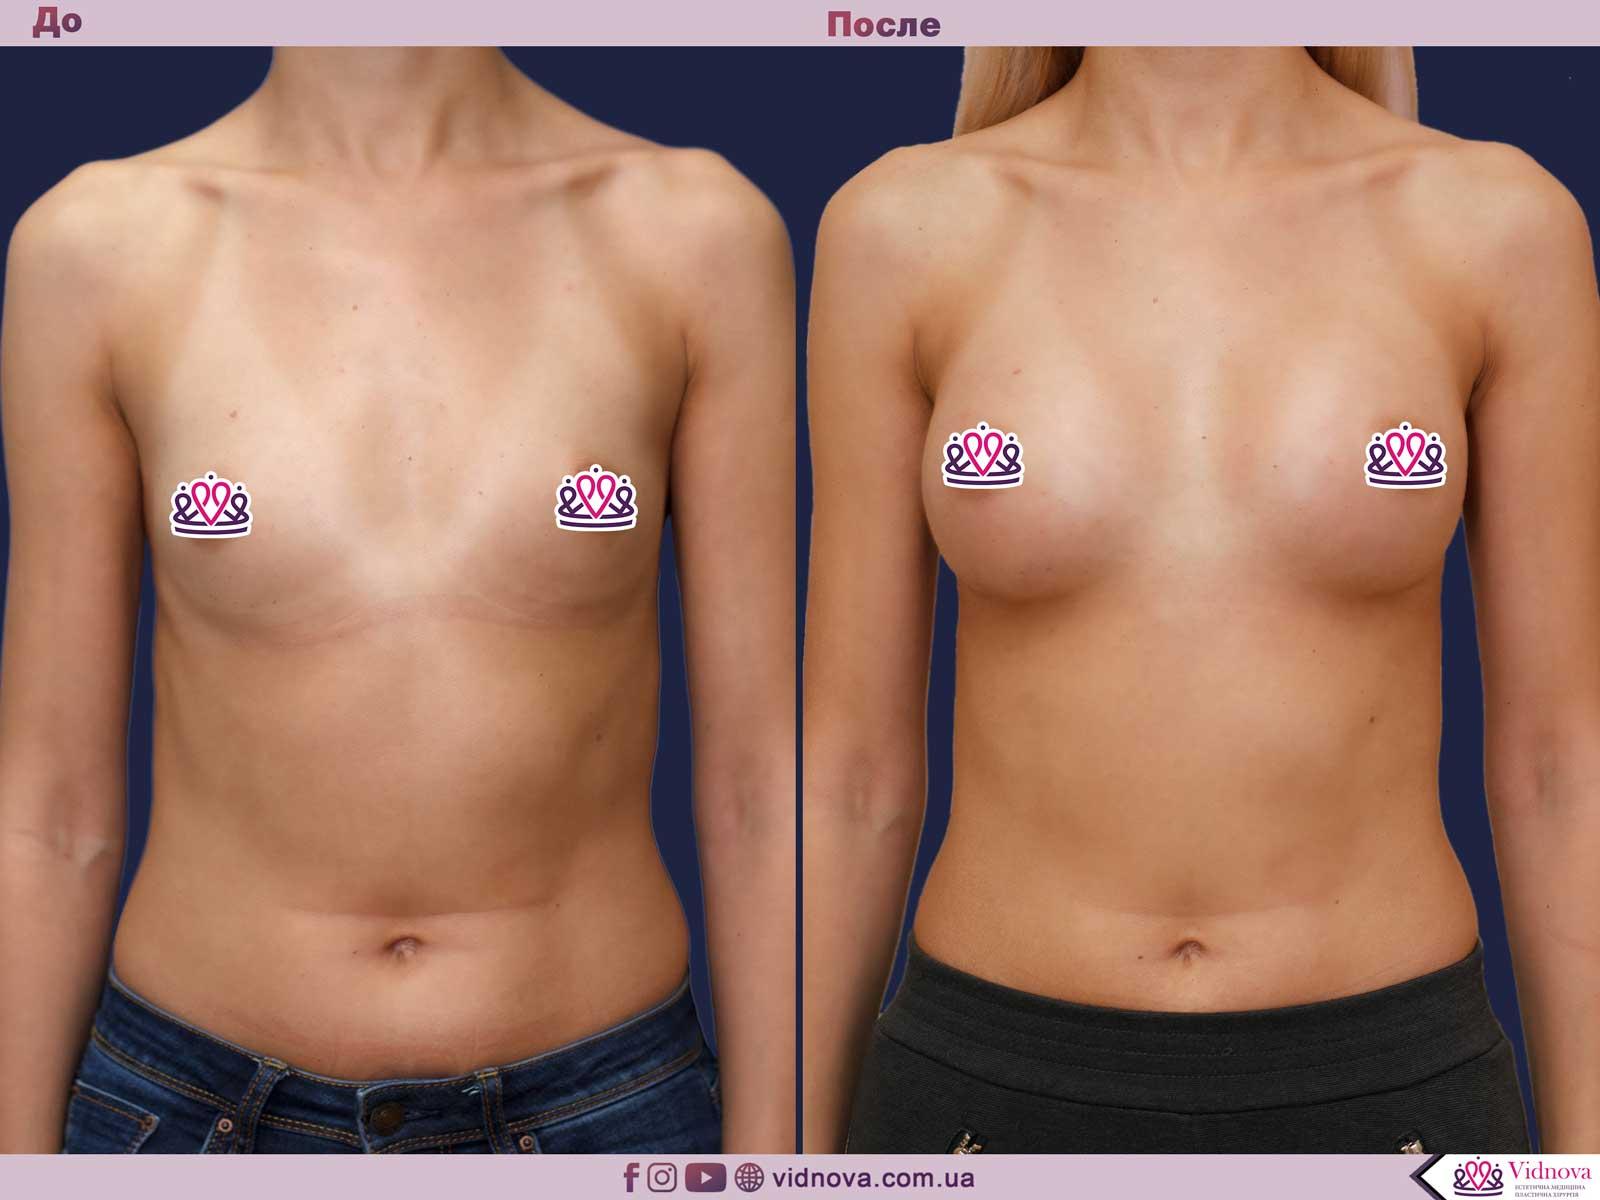 Увеличение груди: Фото ДО и ПОСЛЕ - Пример №73-1 - Клиника Vidnova